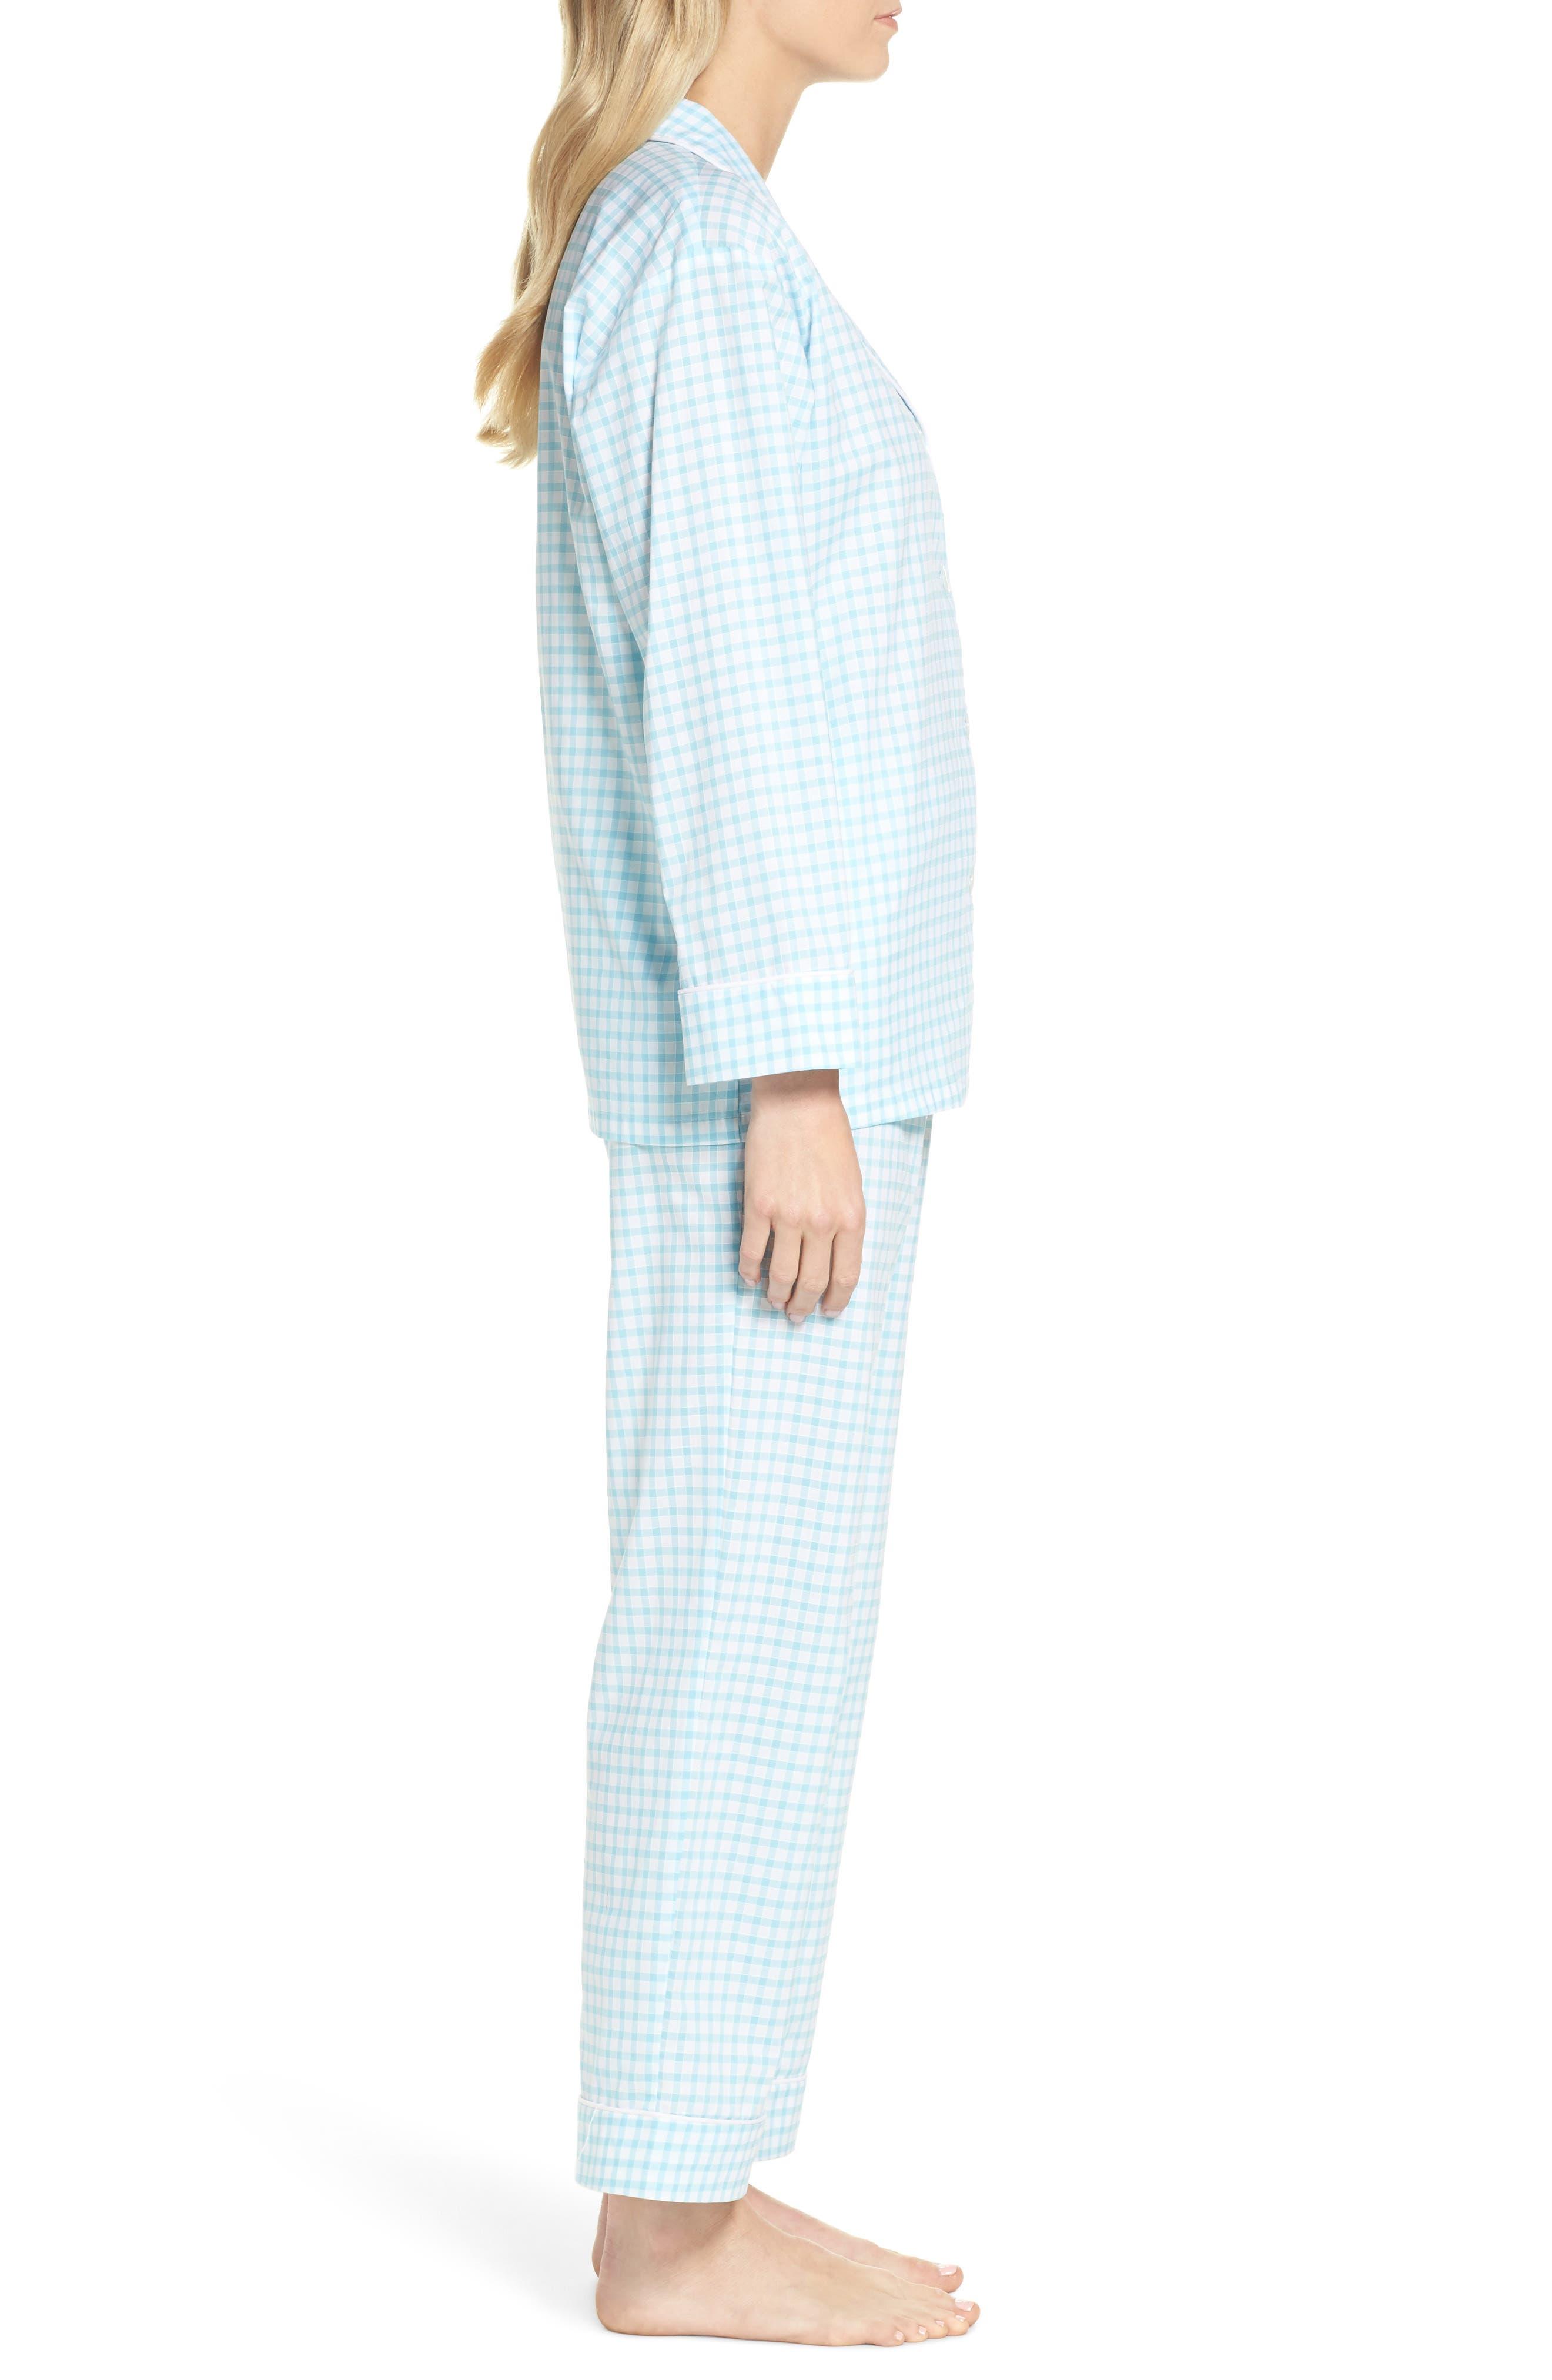 Gingham Pajamas,                             Alternate thumbnail 3, color,                             439